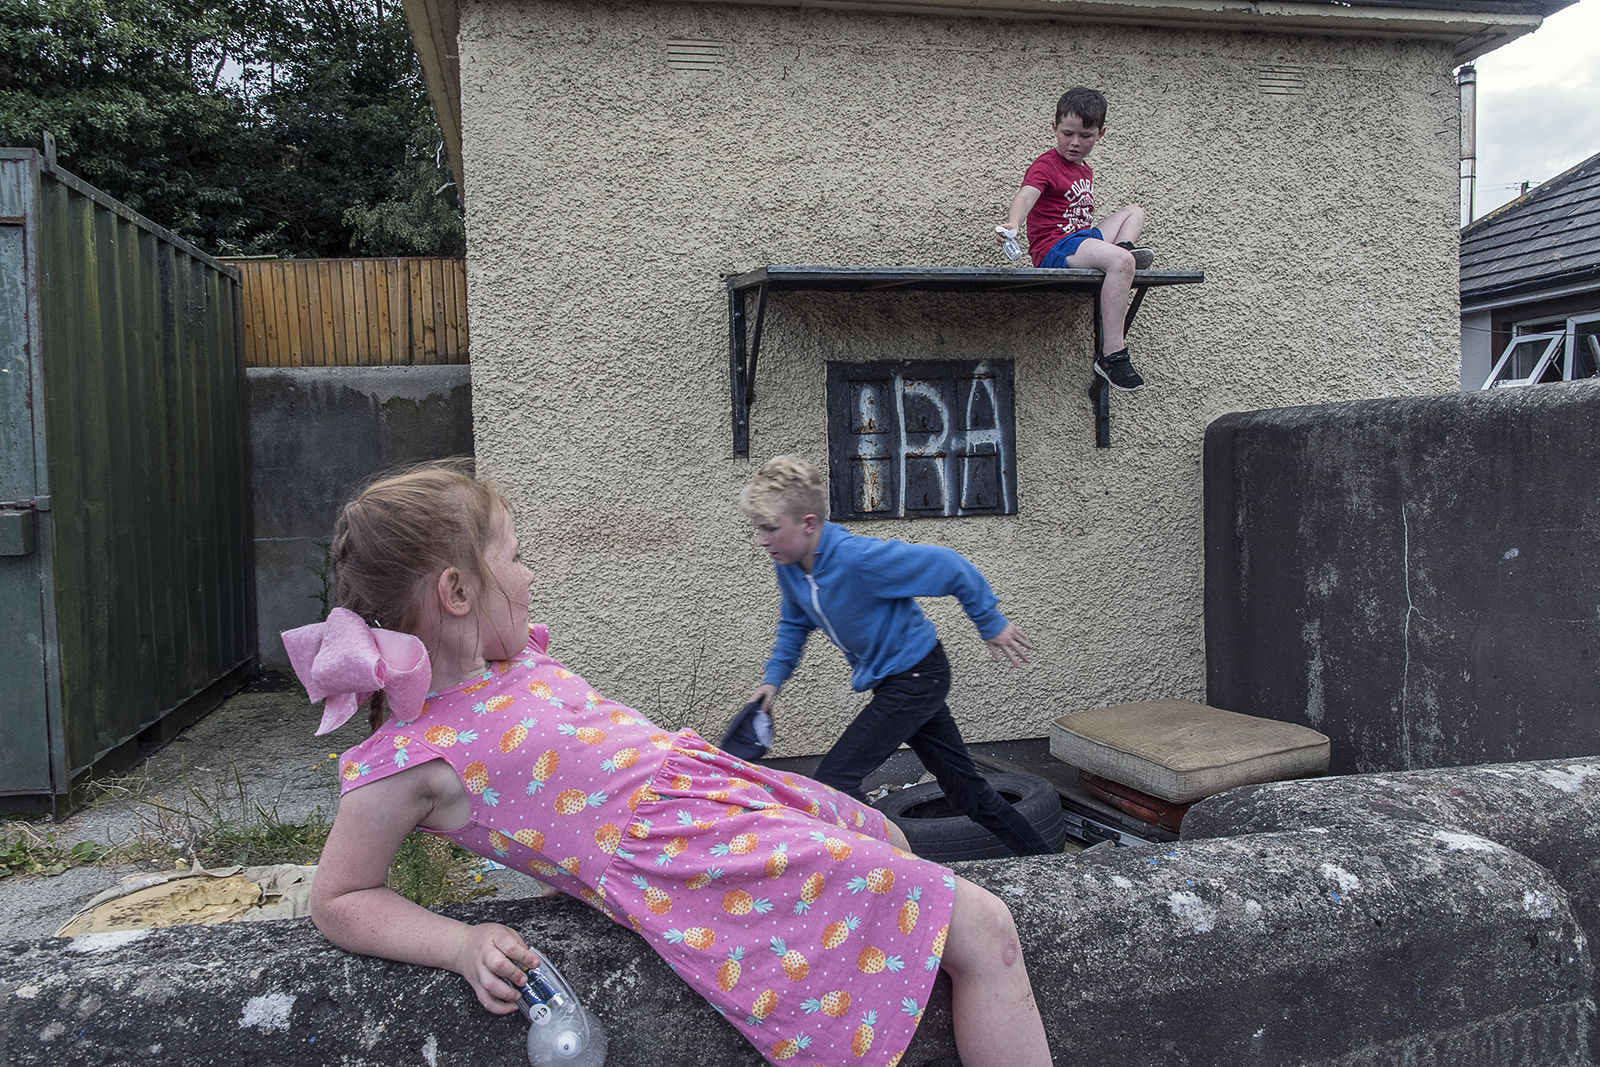 IRA Graffiti, Wexford, Ireland 2019